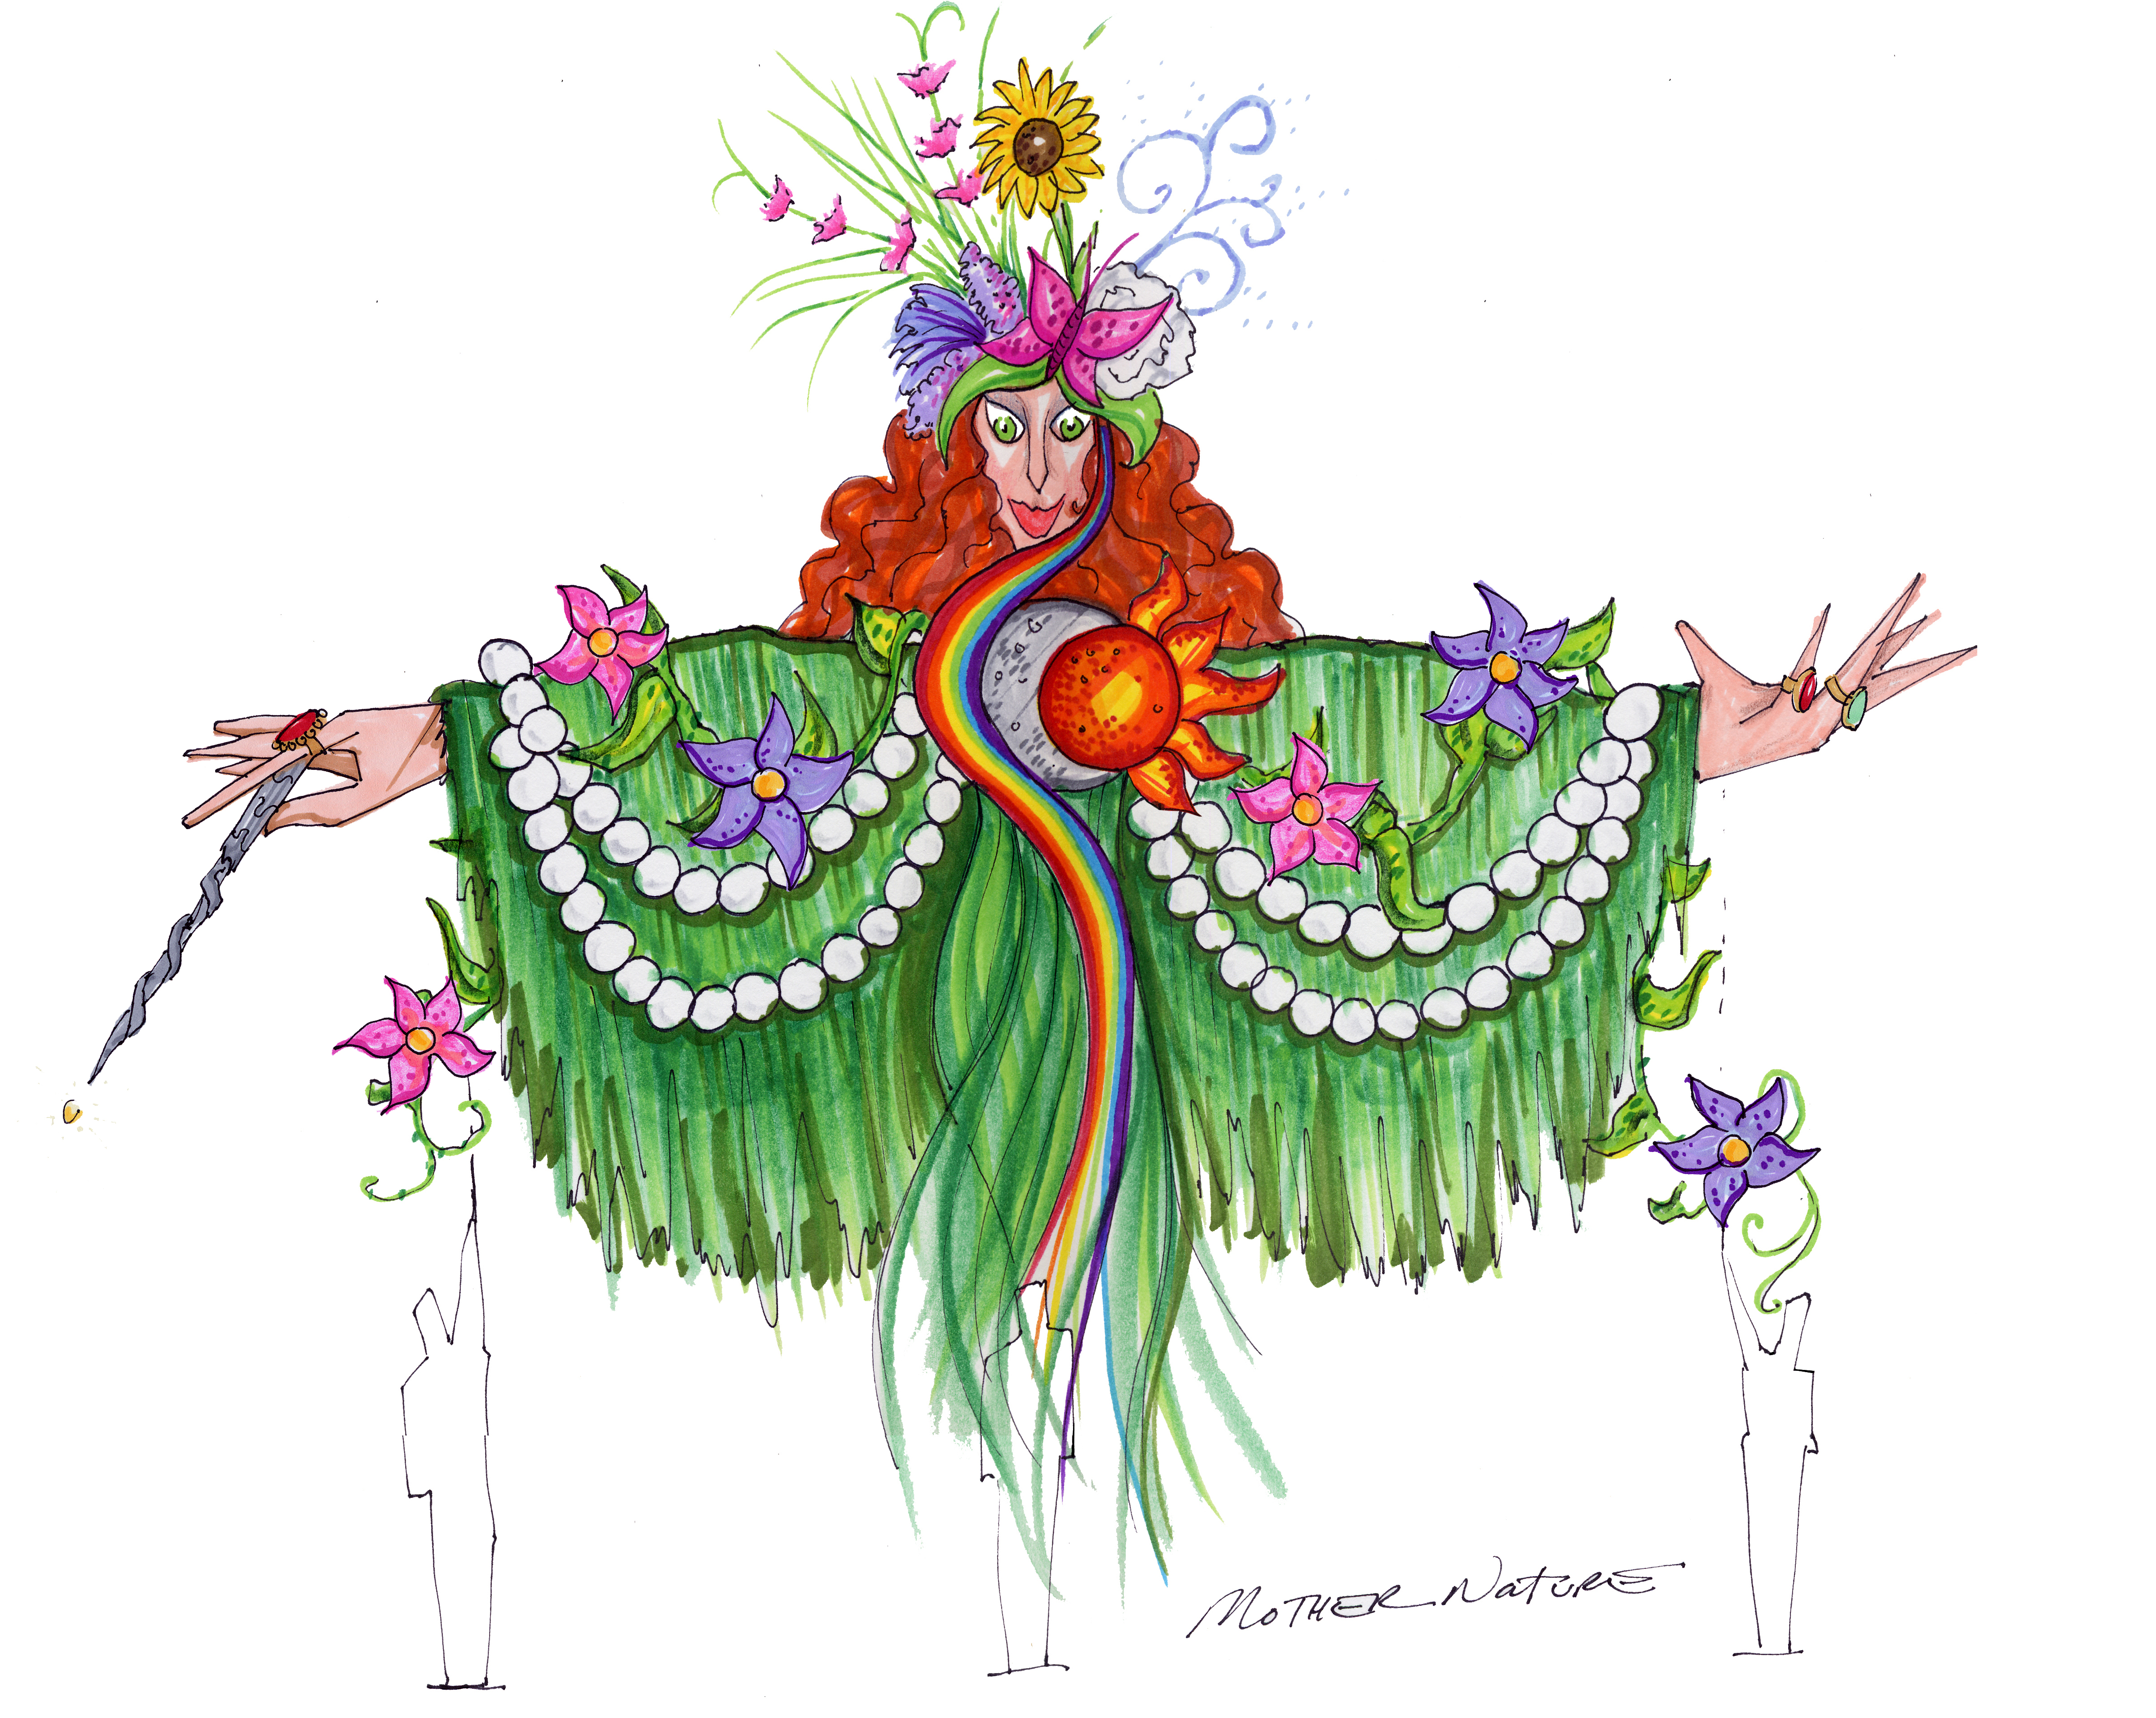 Mardi Gras: Mother Nature